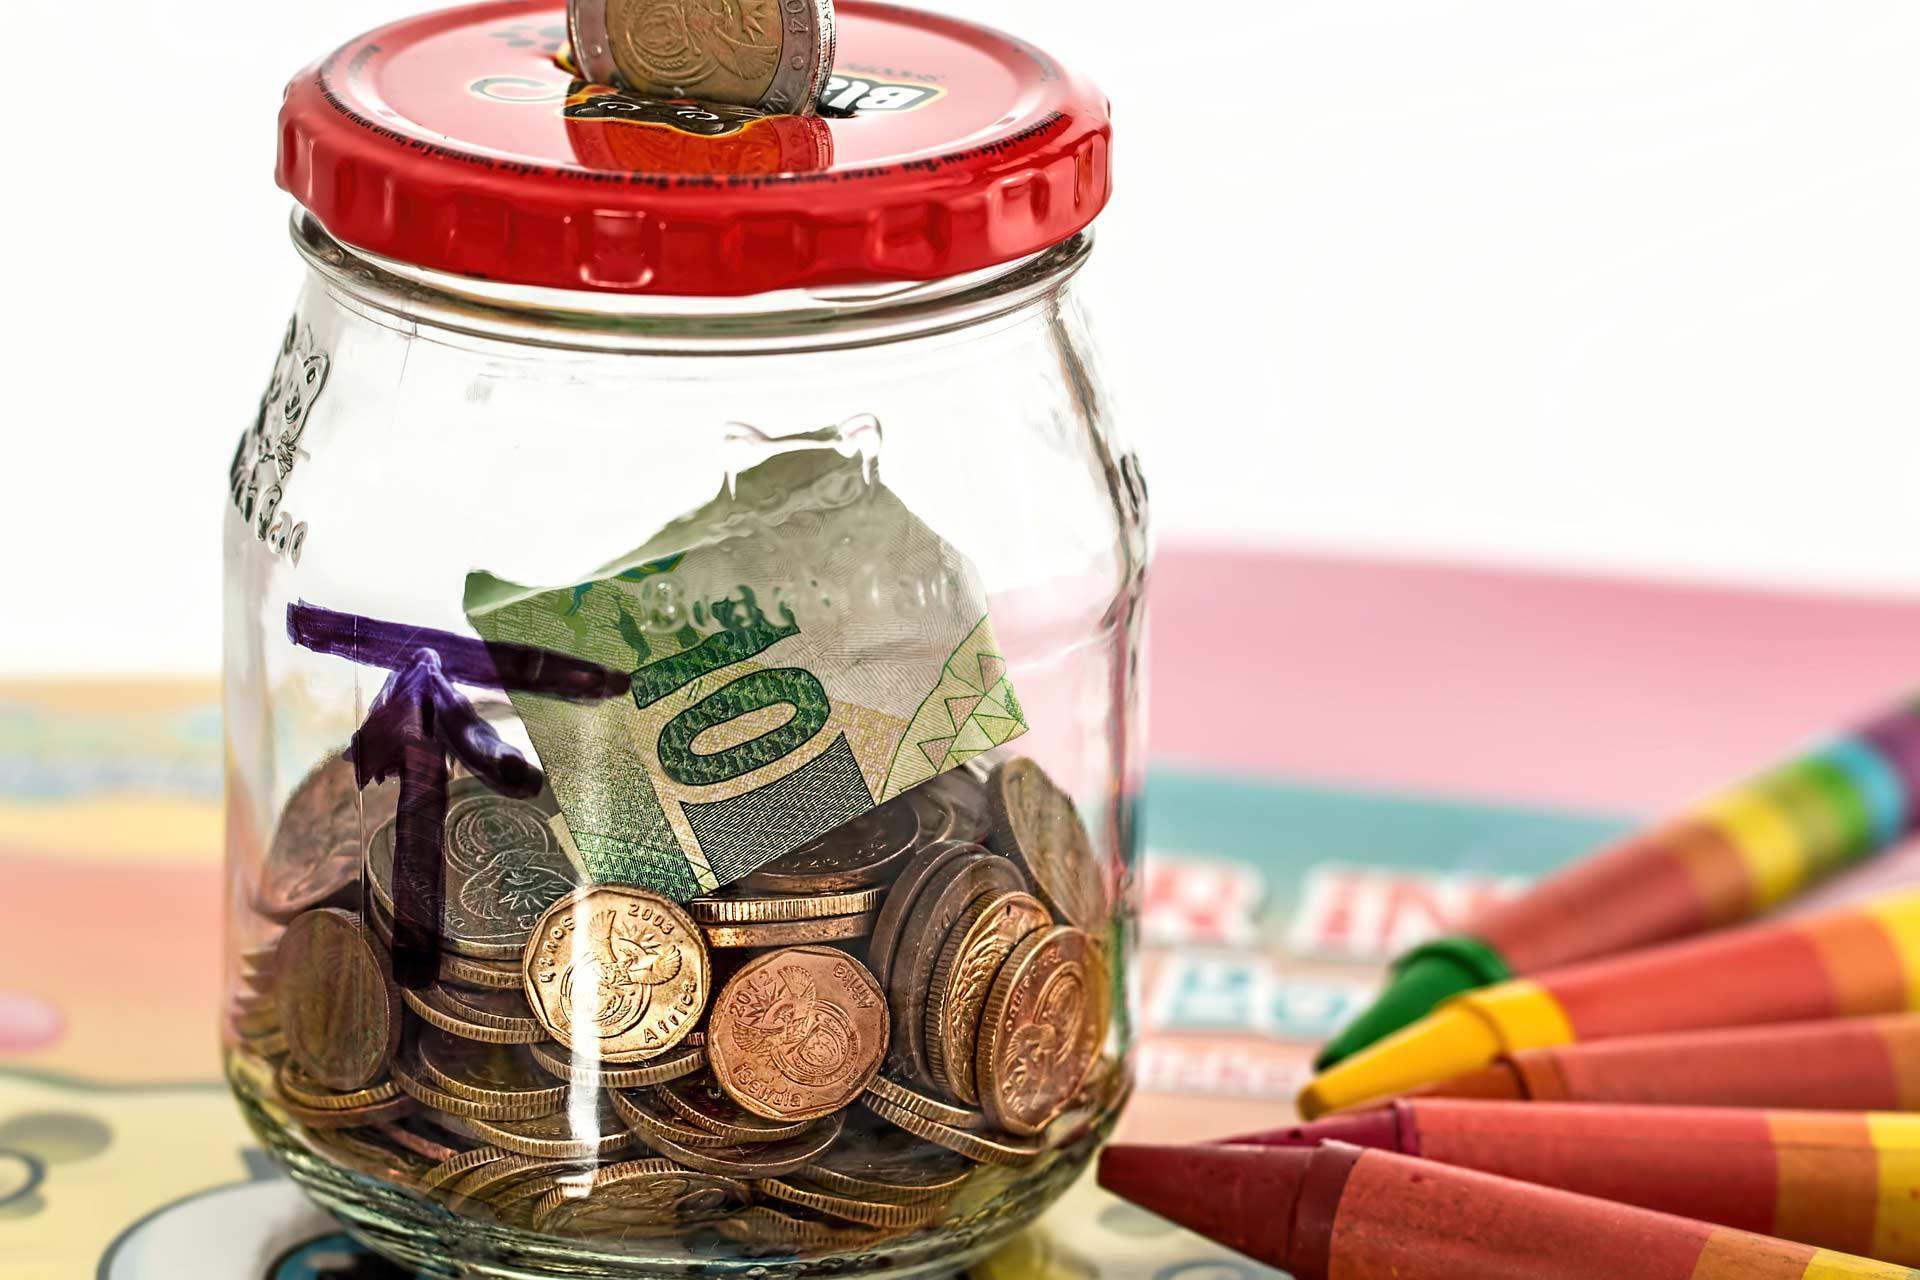 Savings jar with coins